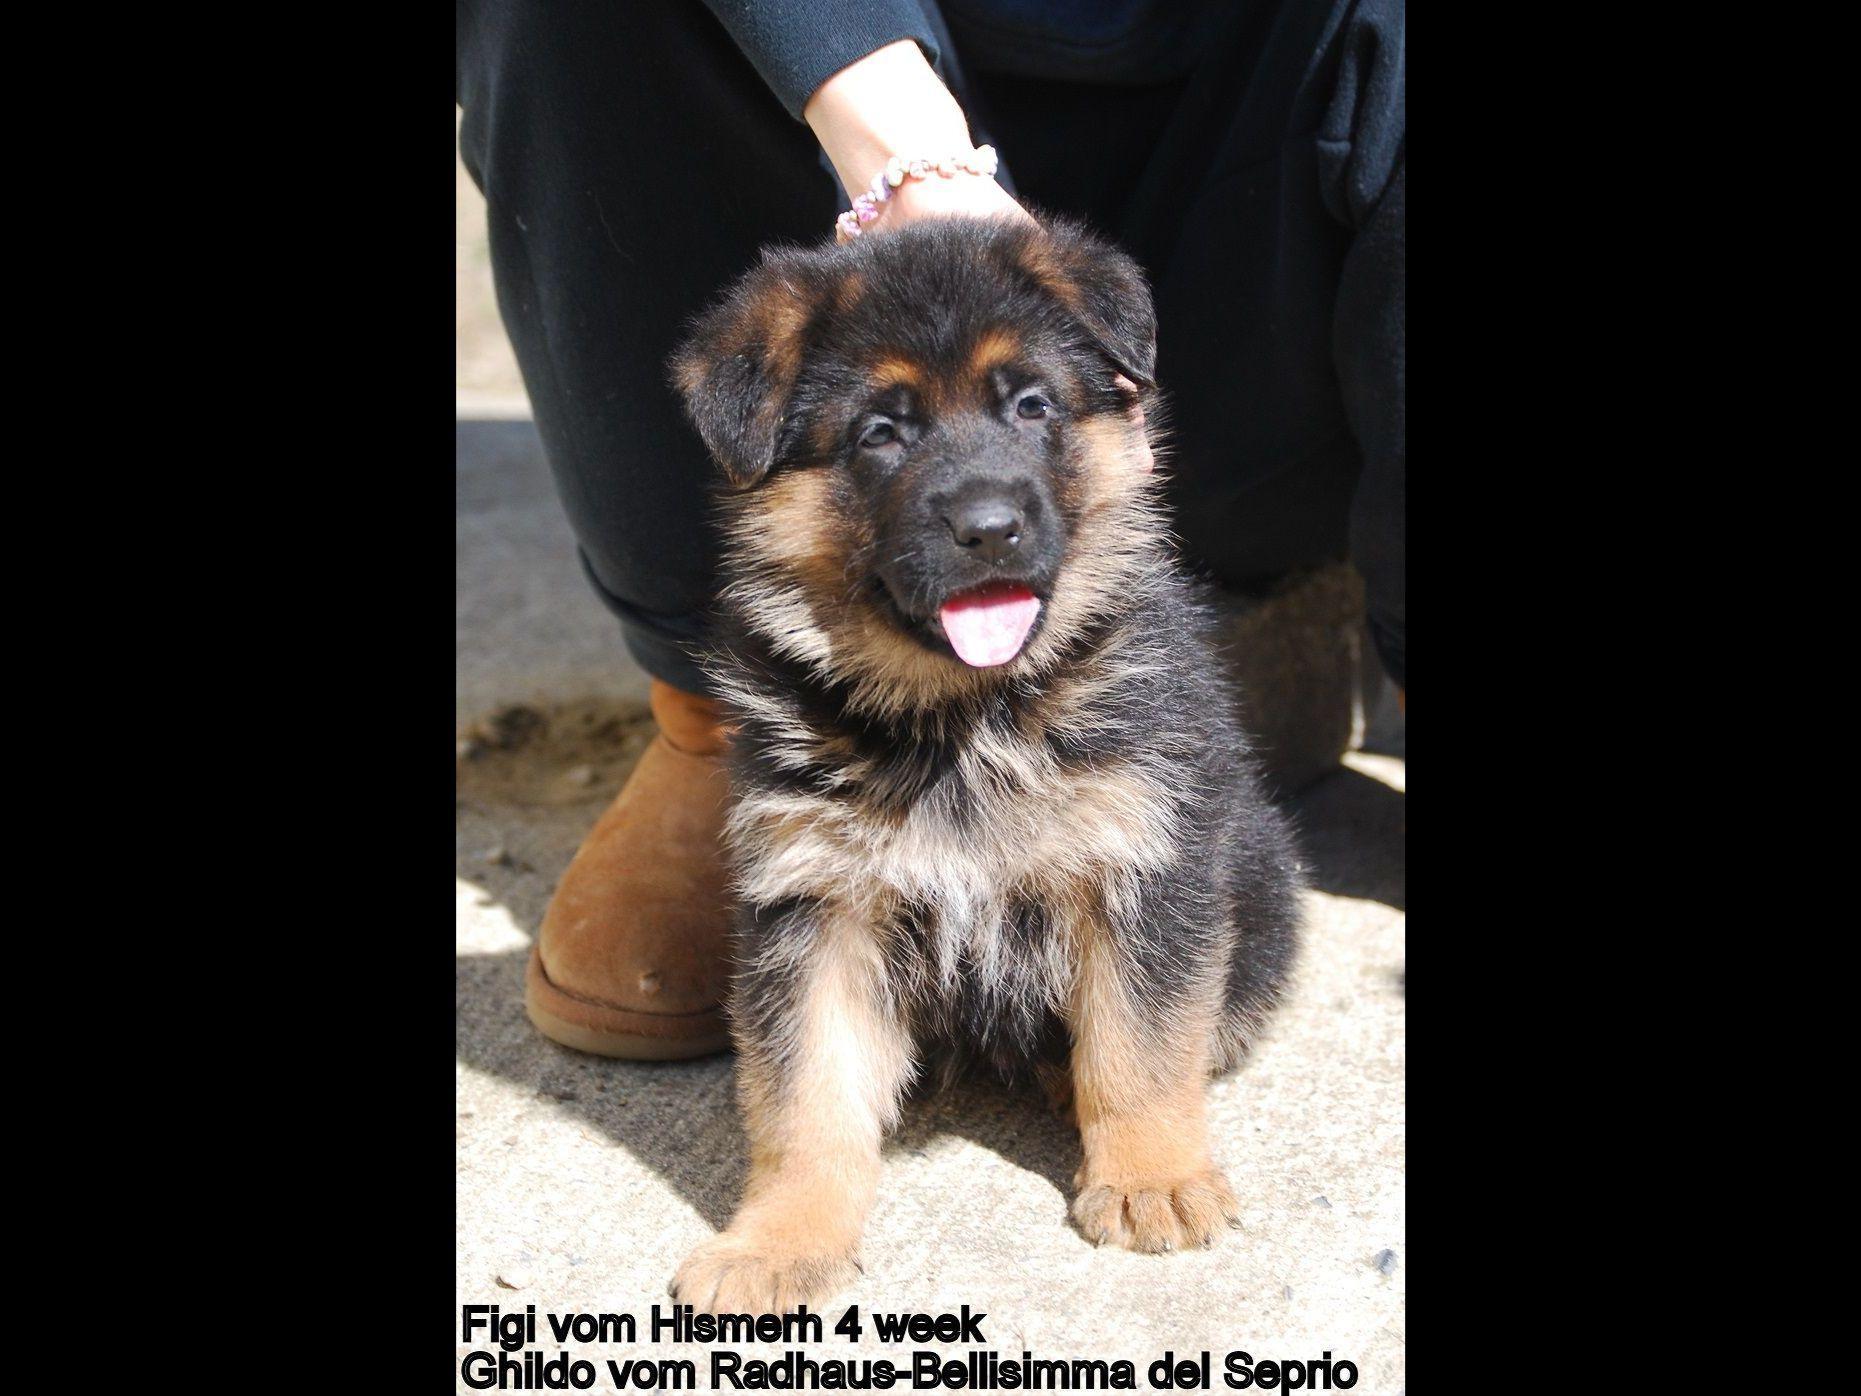 ... Europian German Shepherds and Dobermans - Dog Breeders - Marlton, NJ